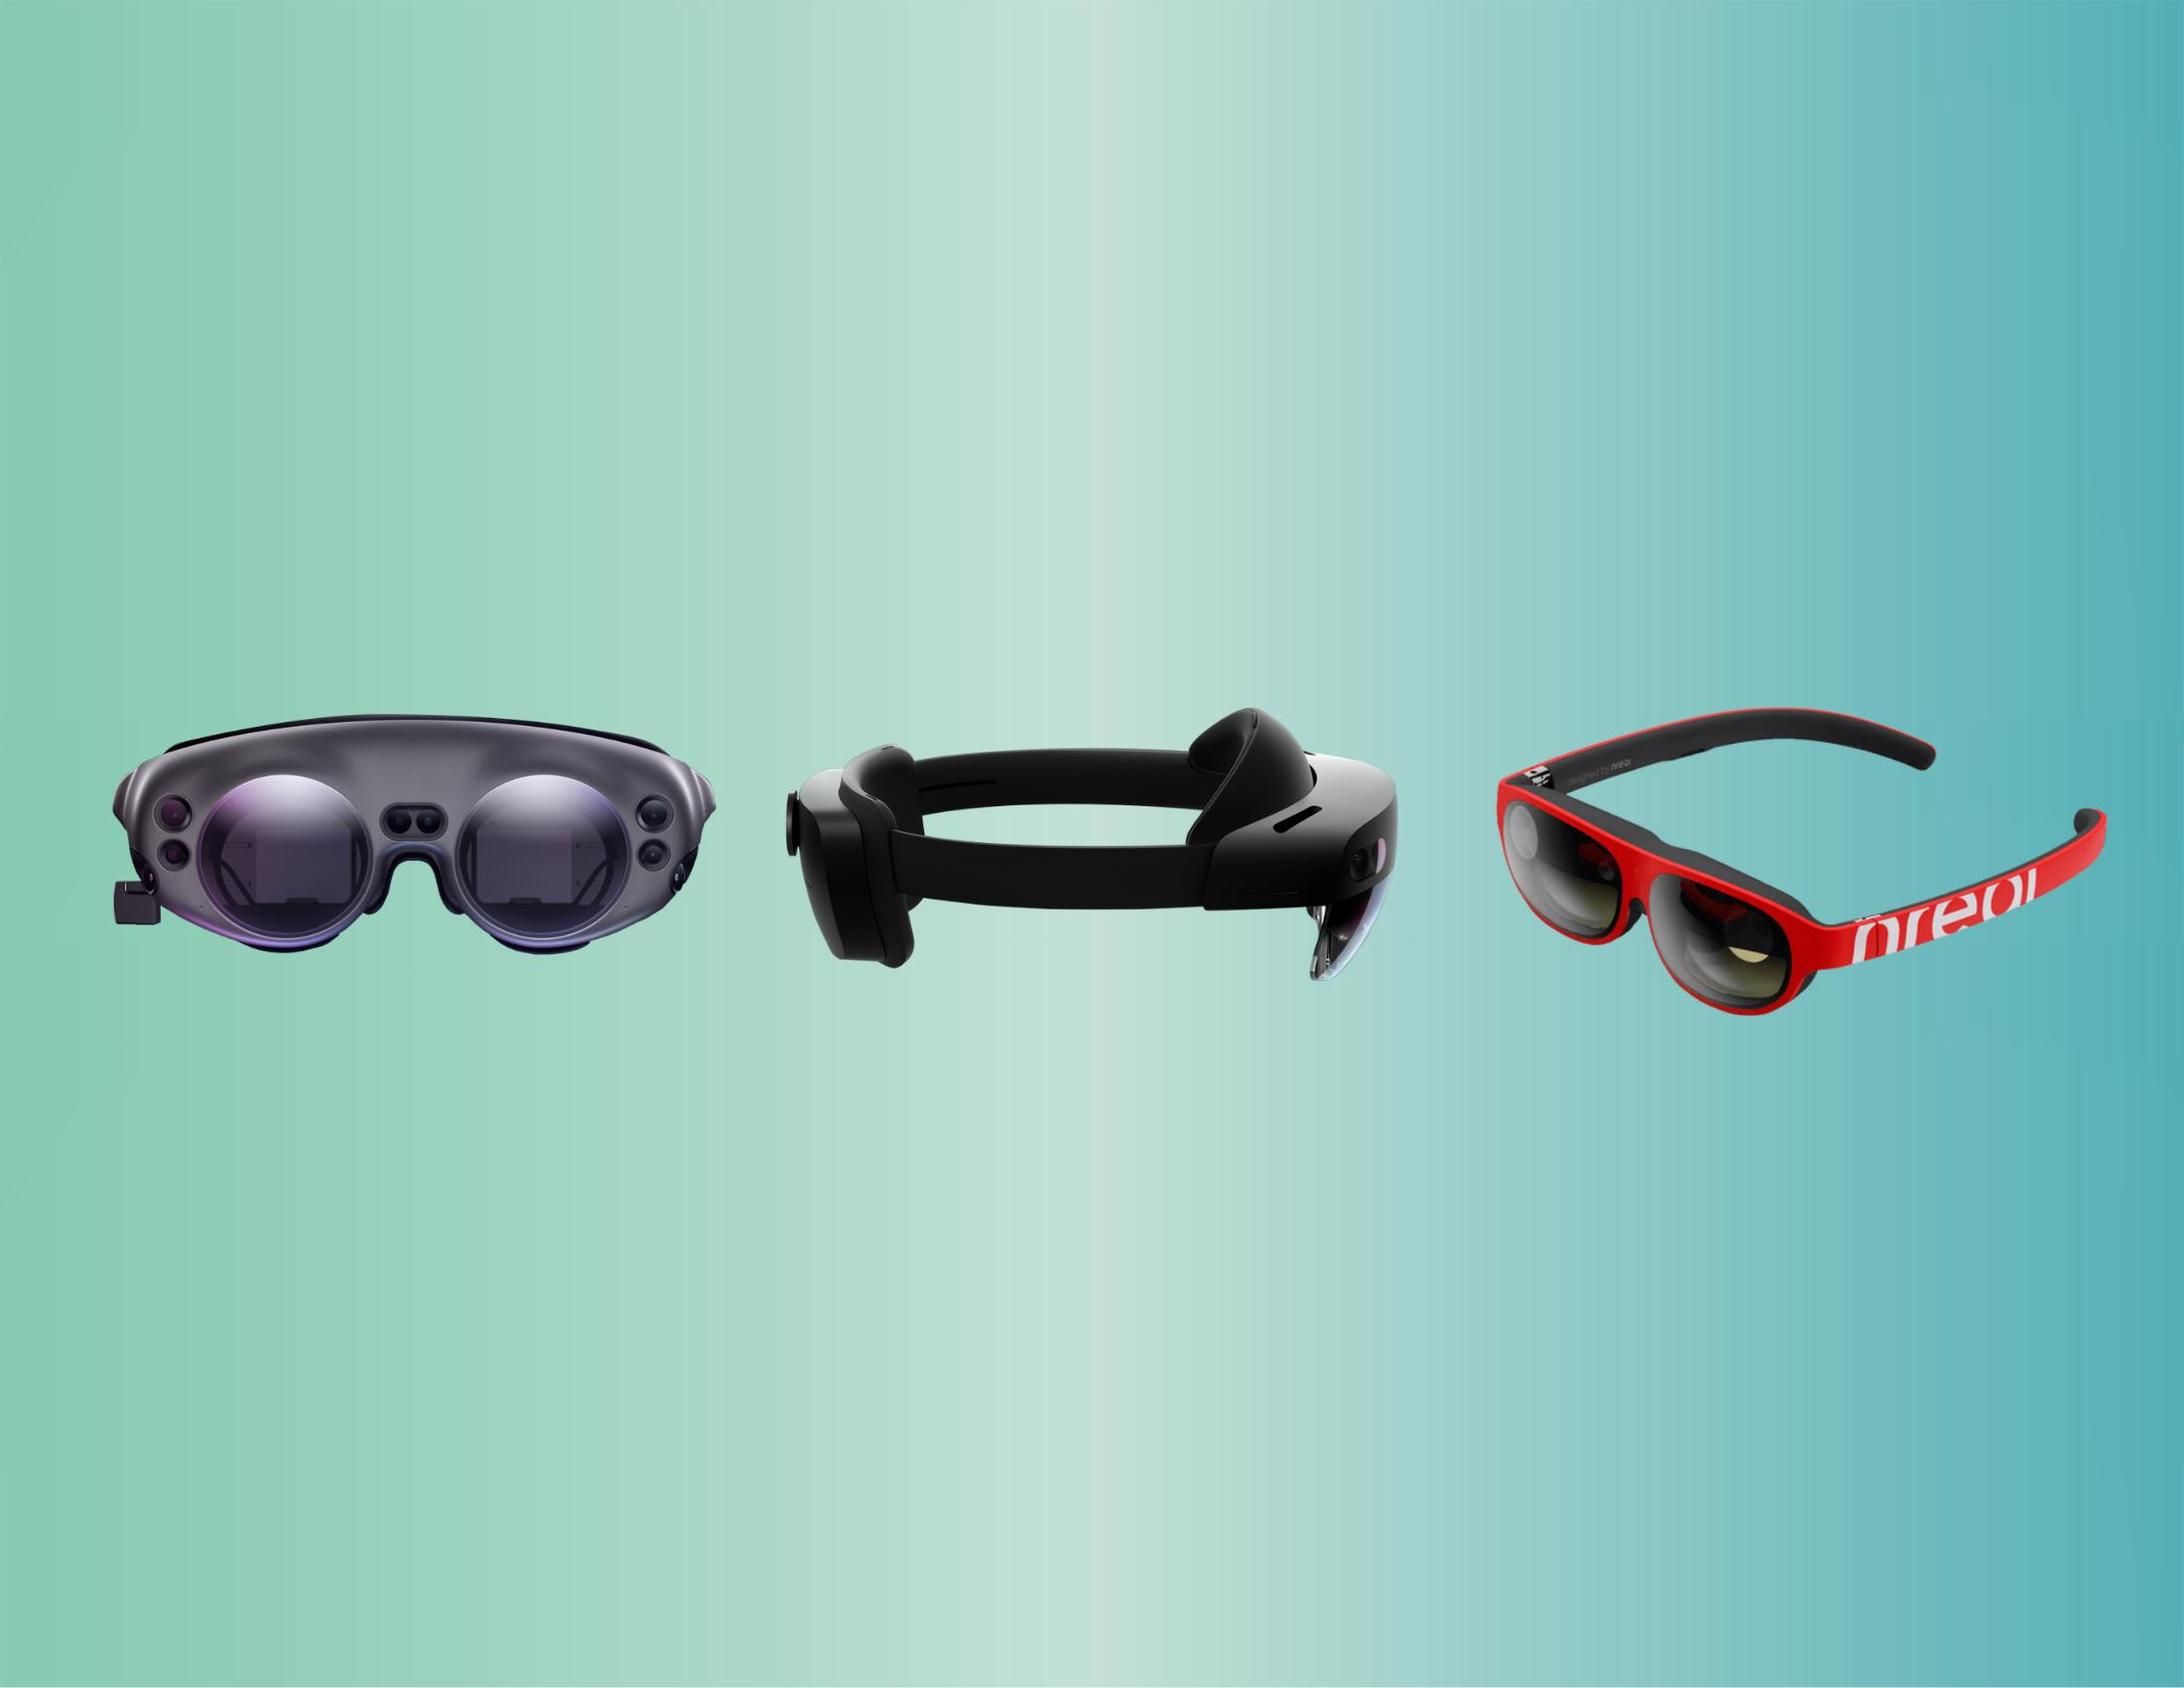 VR Expert AR Headset